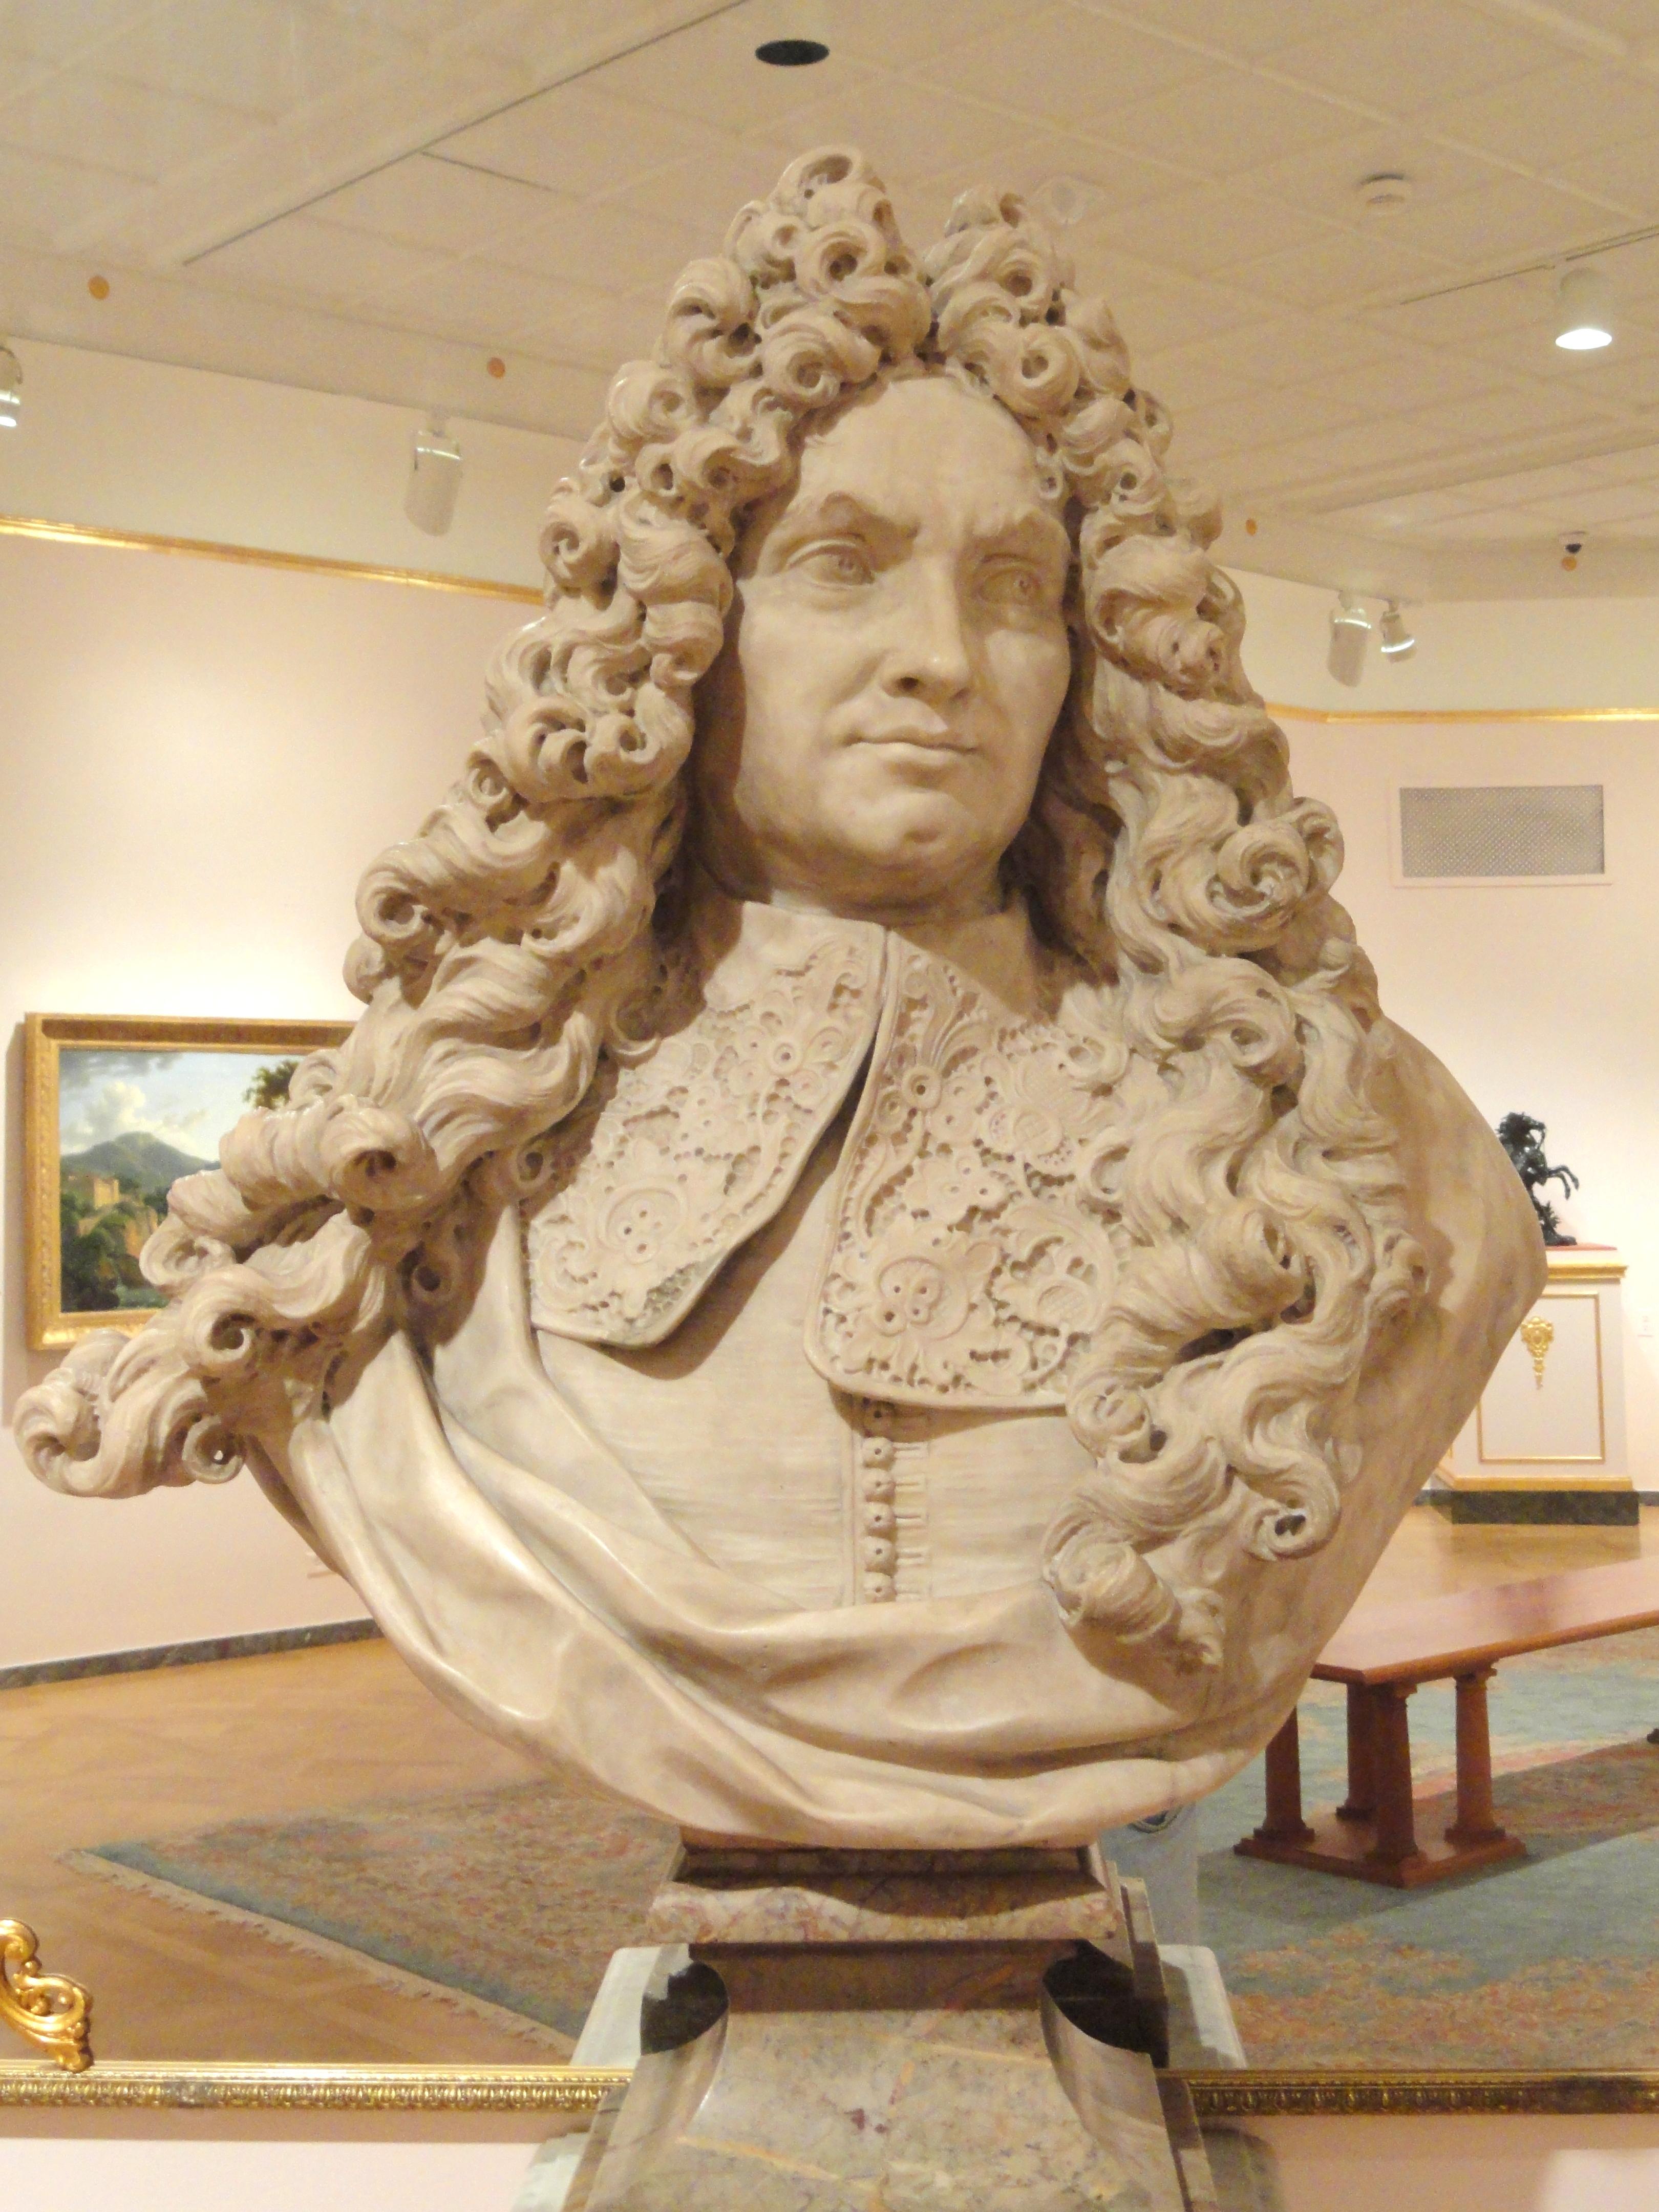 File:Bust of Edouard Colbert, Marquis de Villacerf, by Antoine.